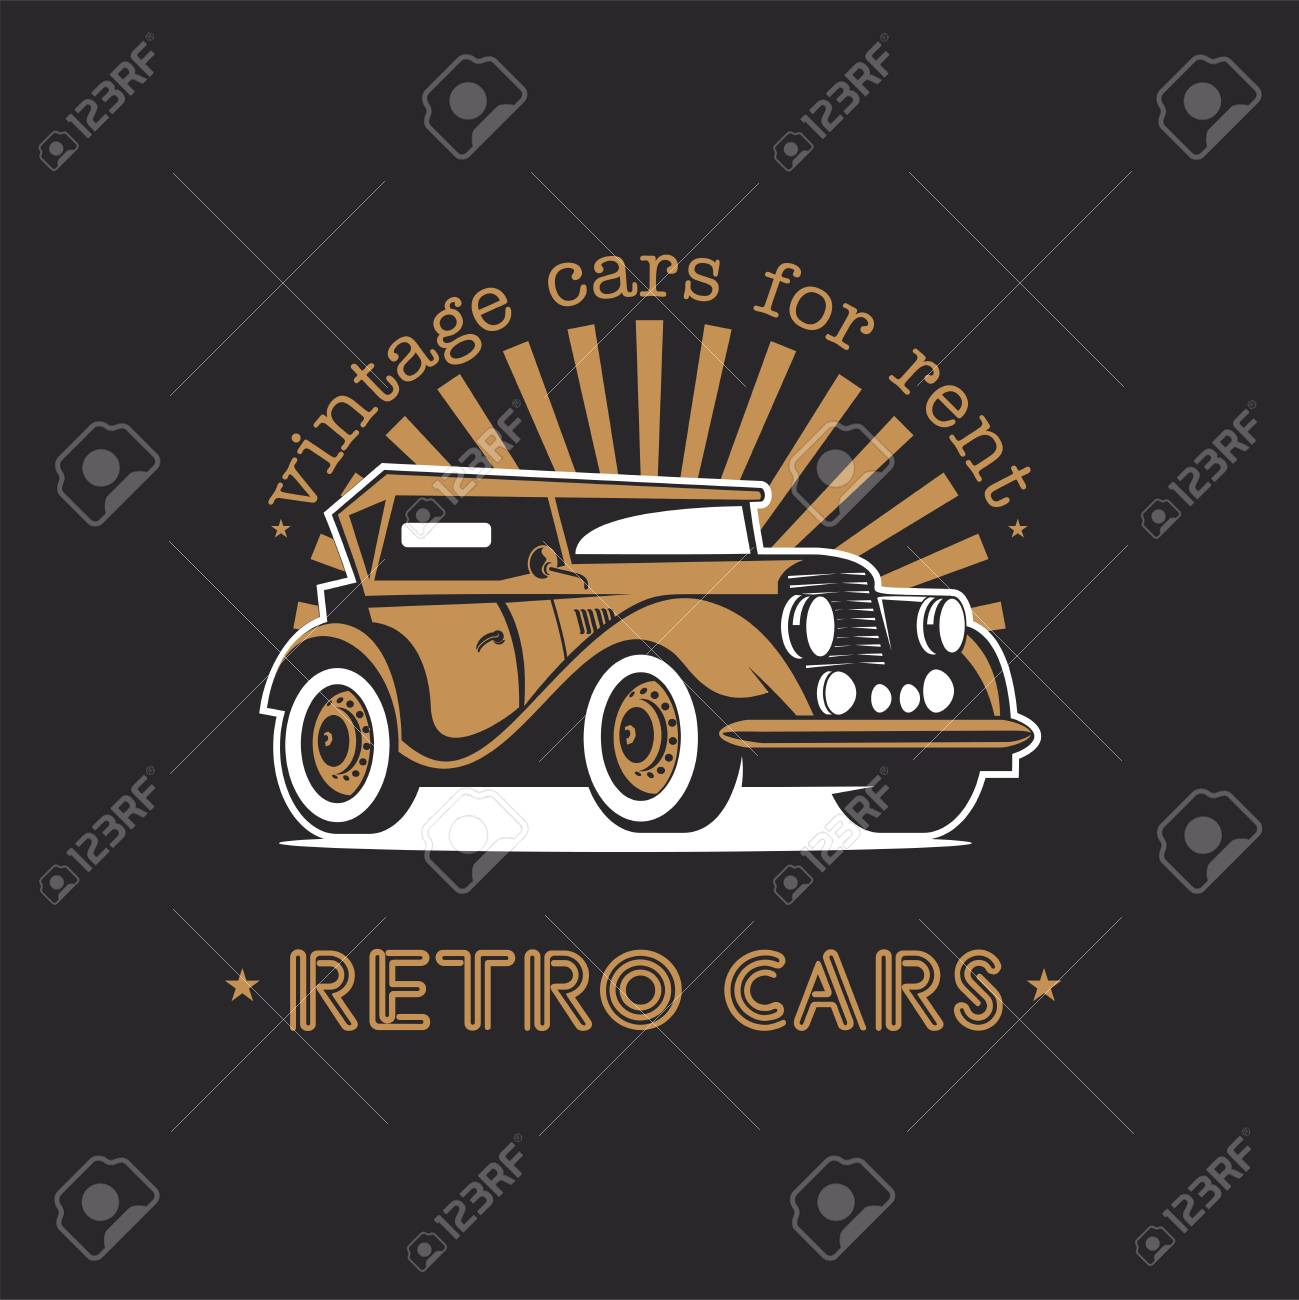 Vintage Cars For Rent. Retro Car. Vector Logo On A Black Background ...